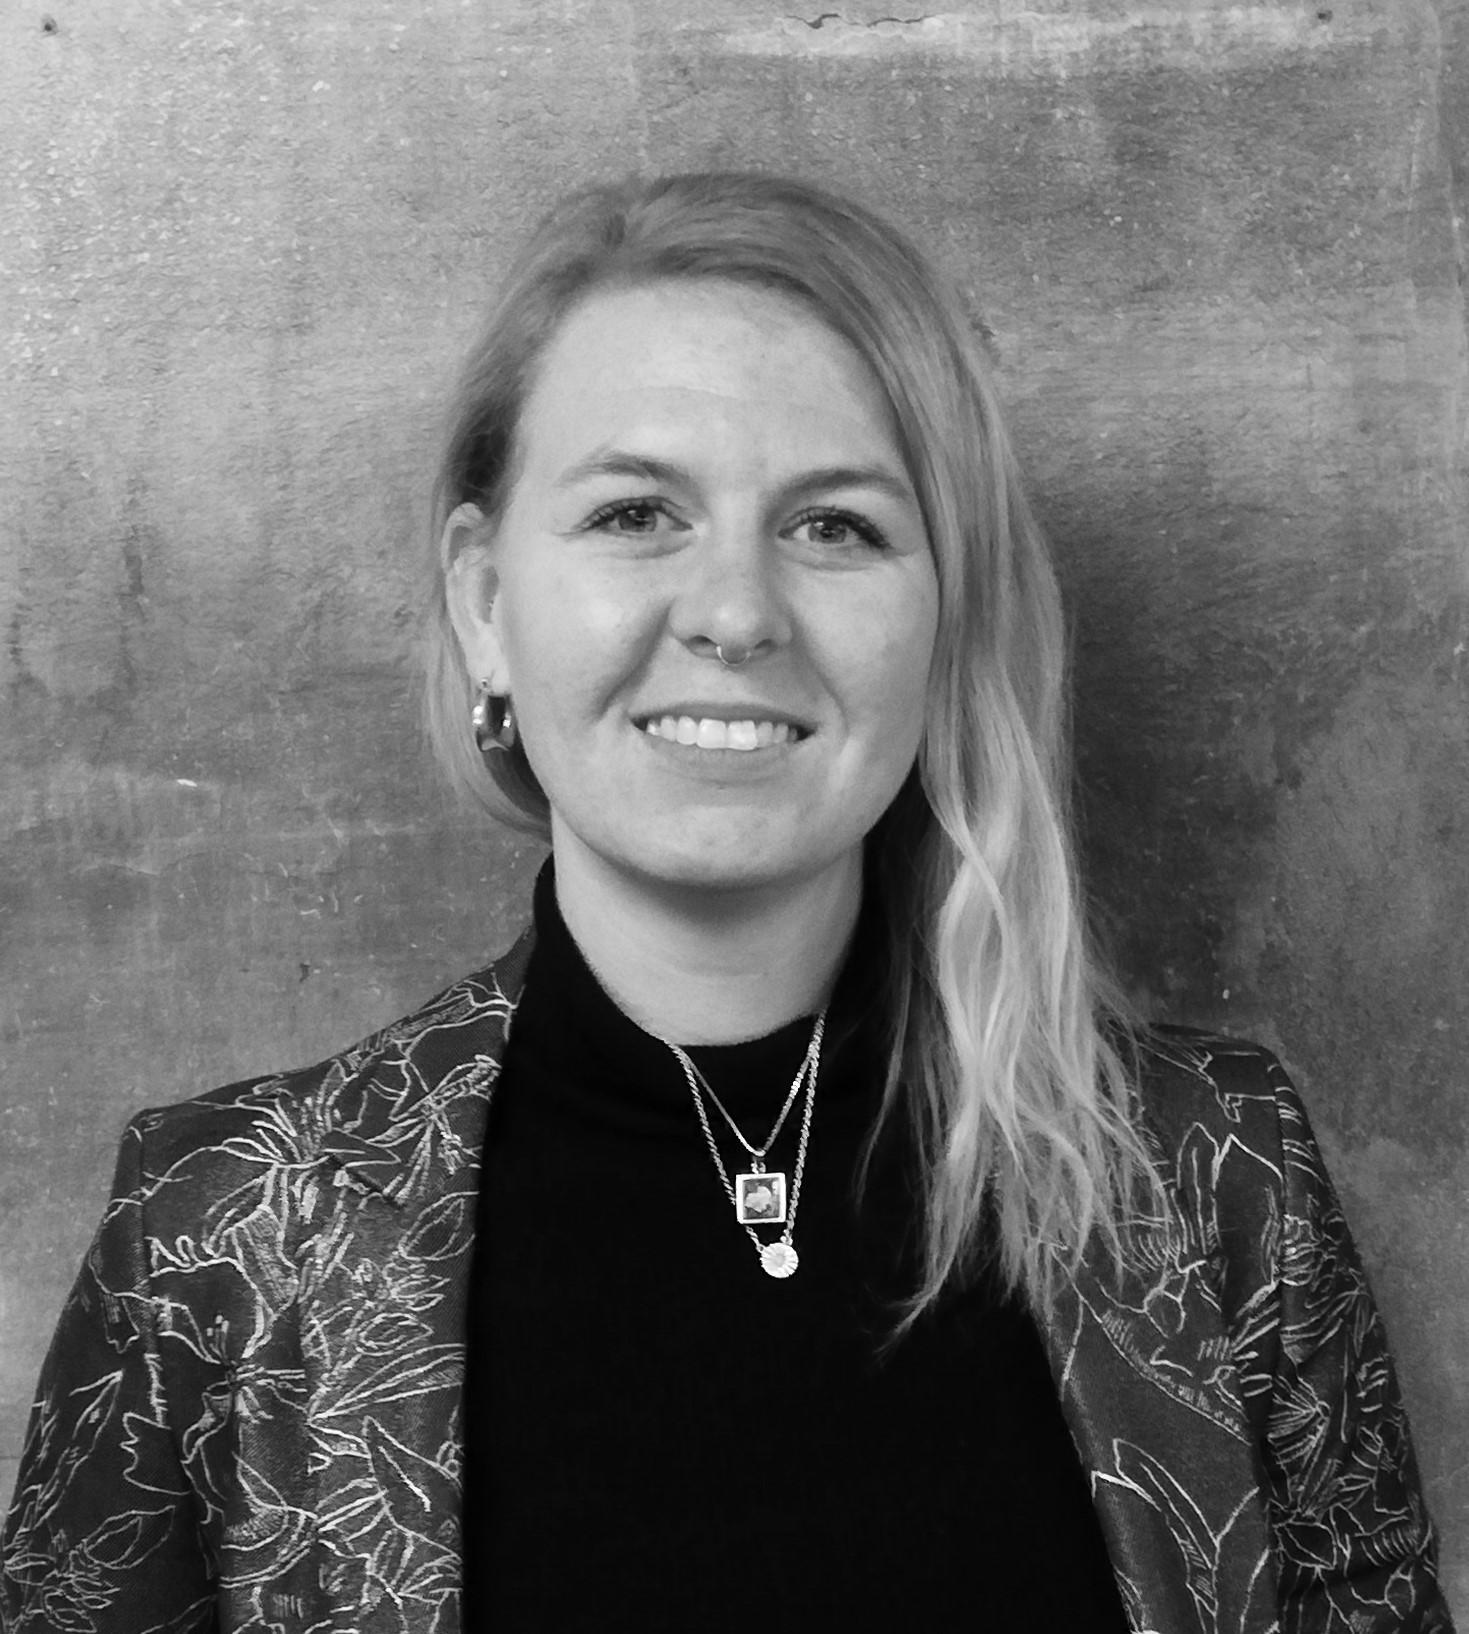 Kamilla Rathcke Solevad Engesgaard